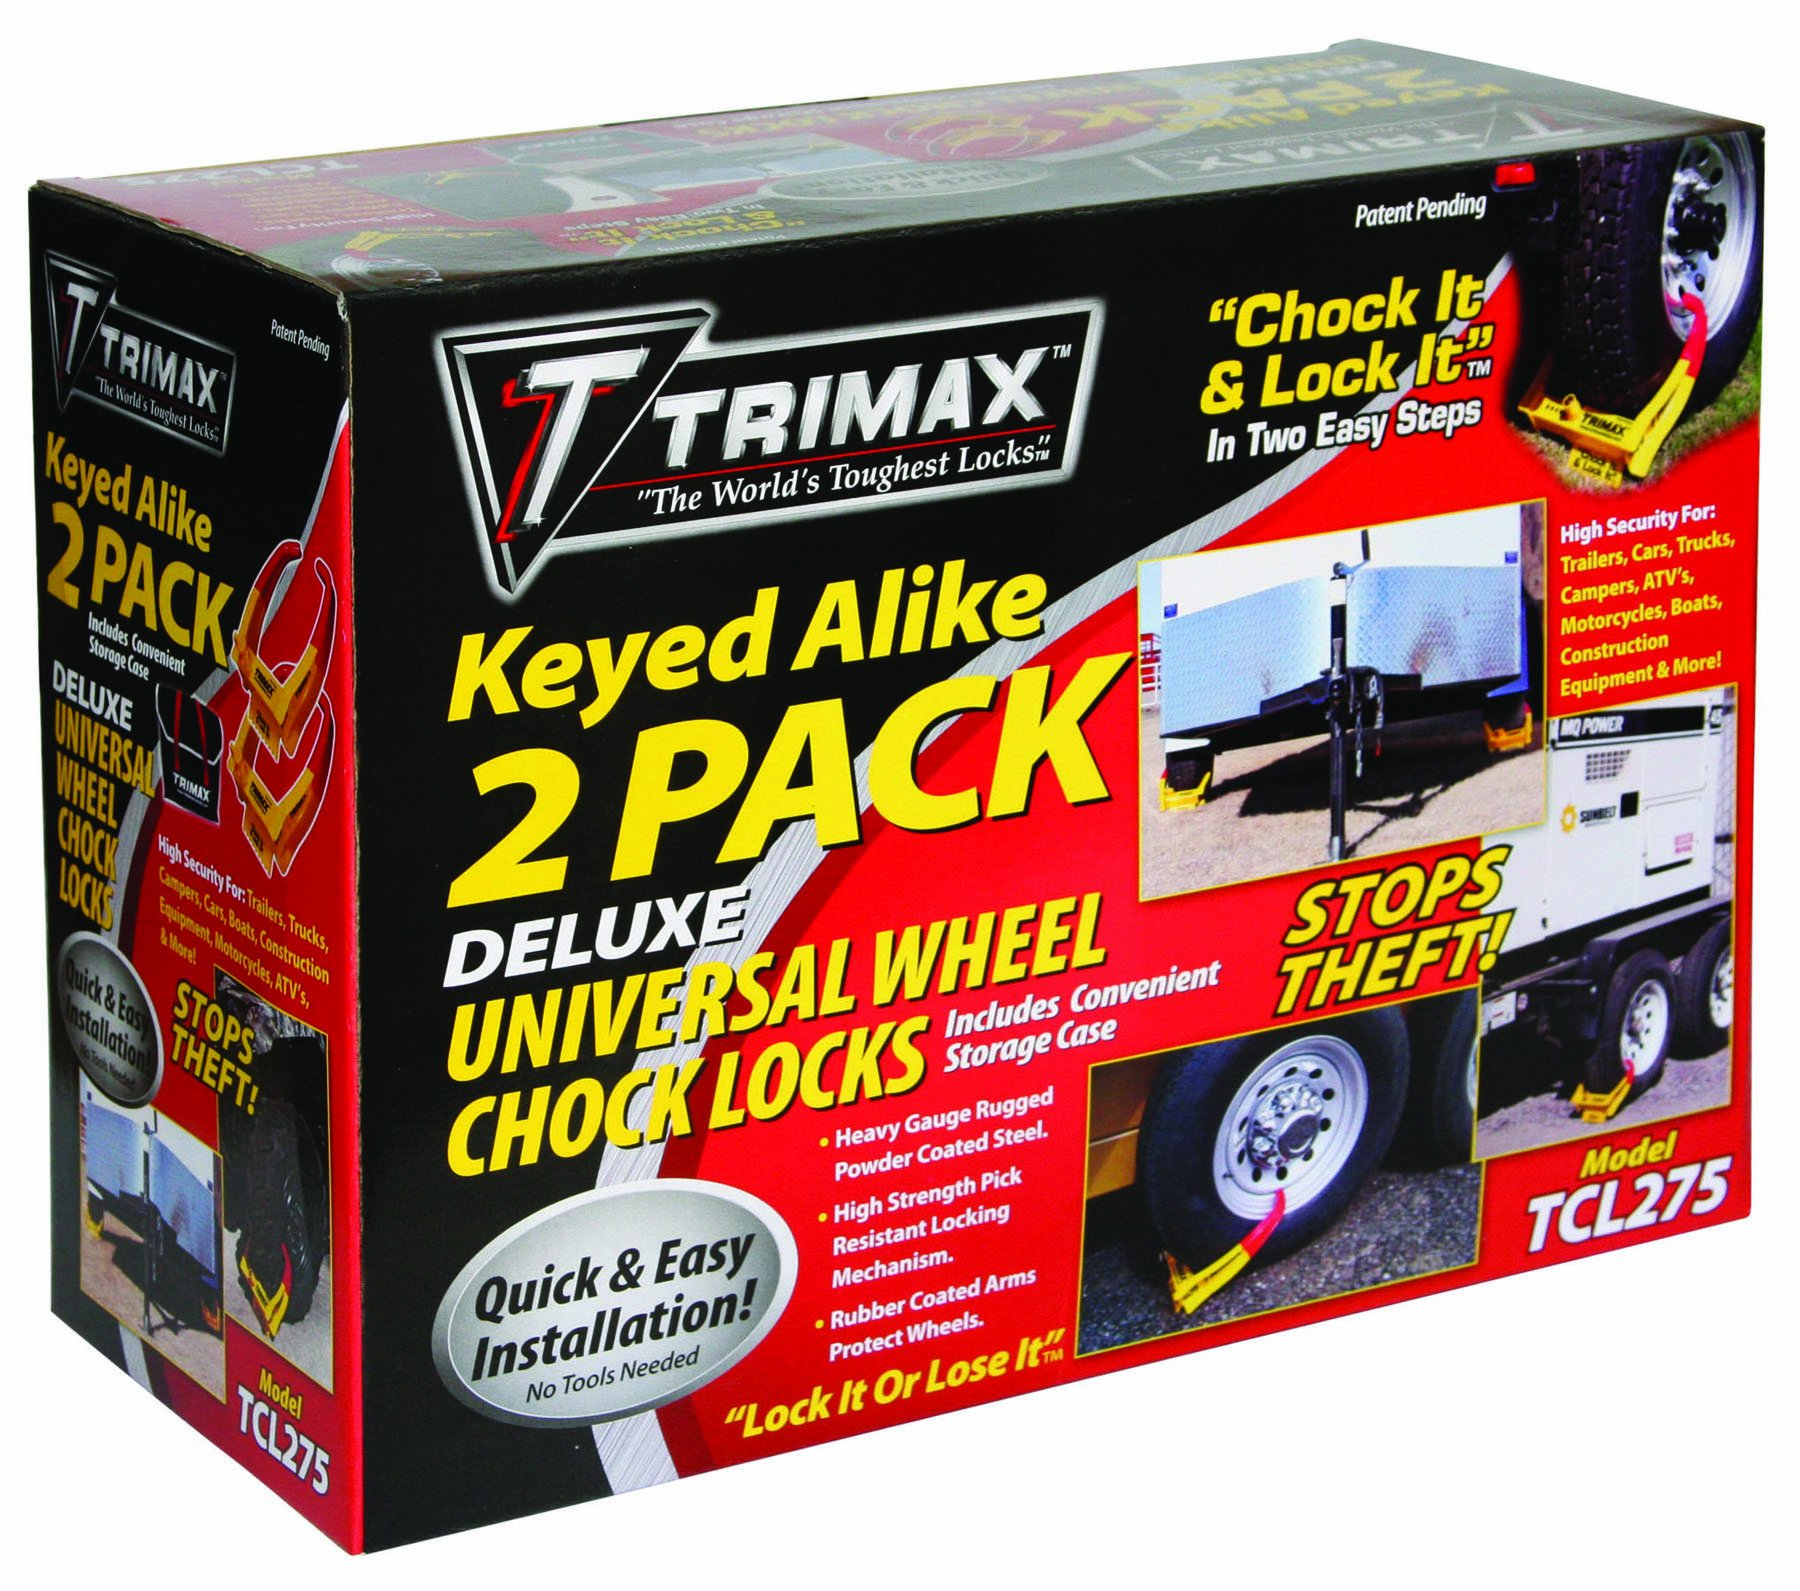 Trimax TCL275 Wheel Chock Lock 2-Pack